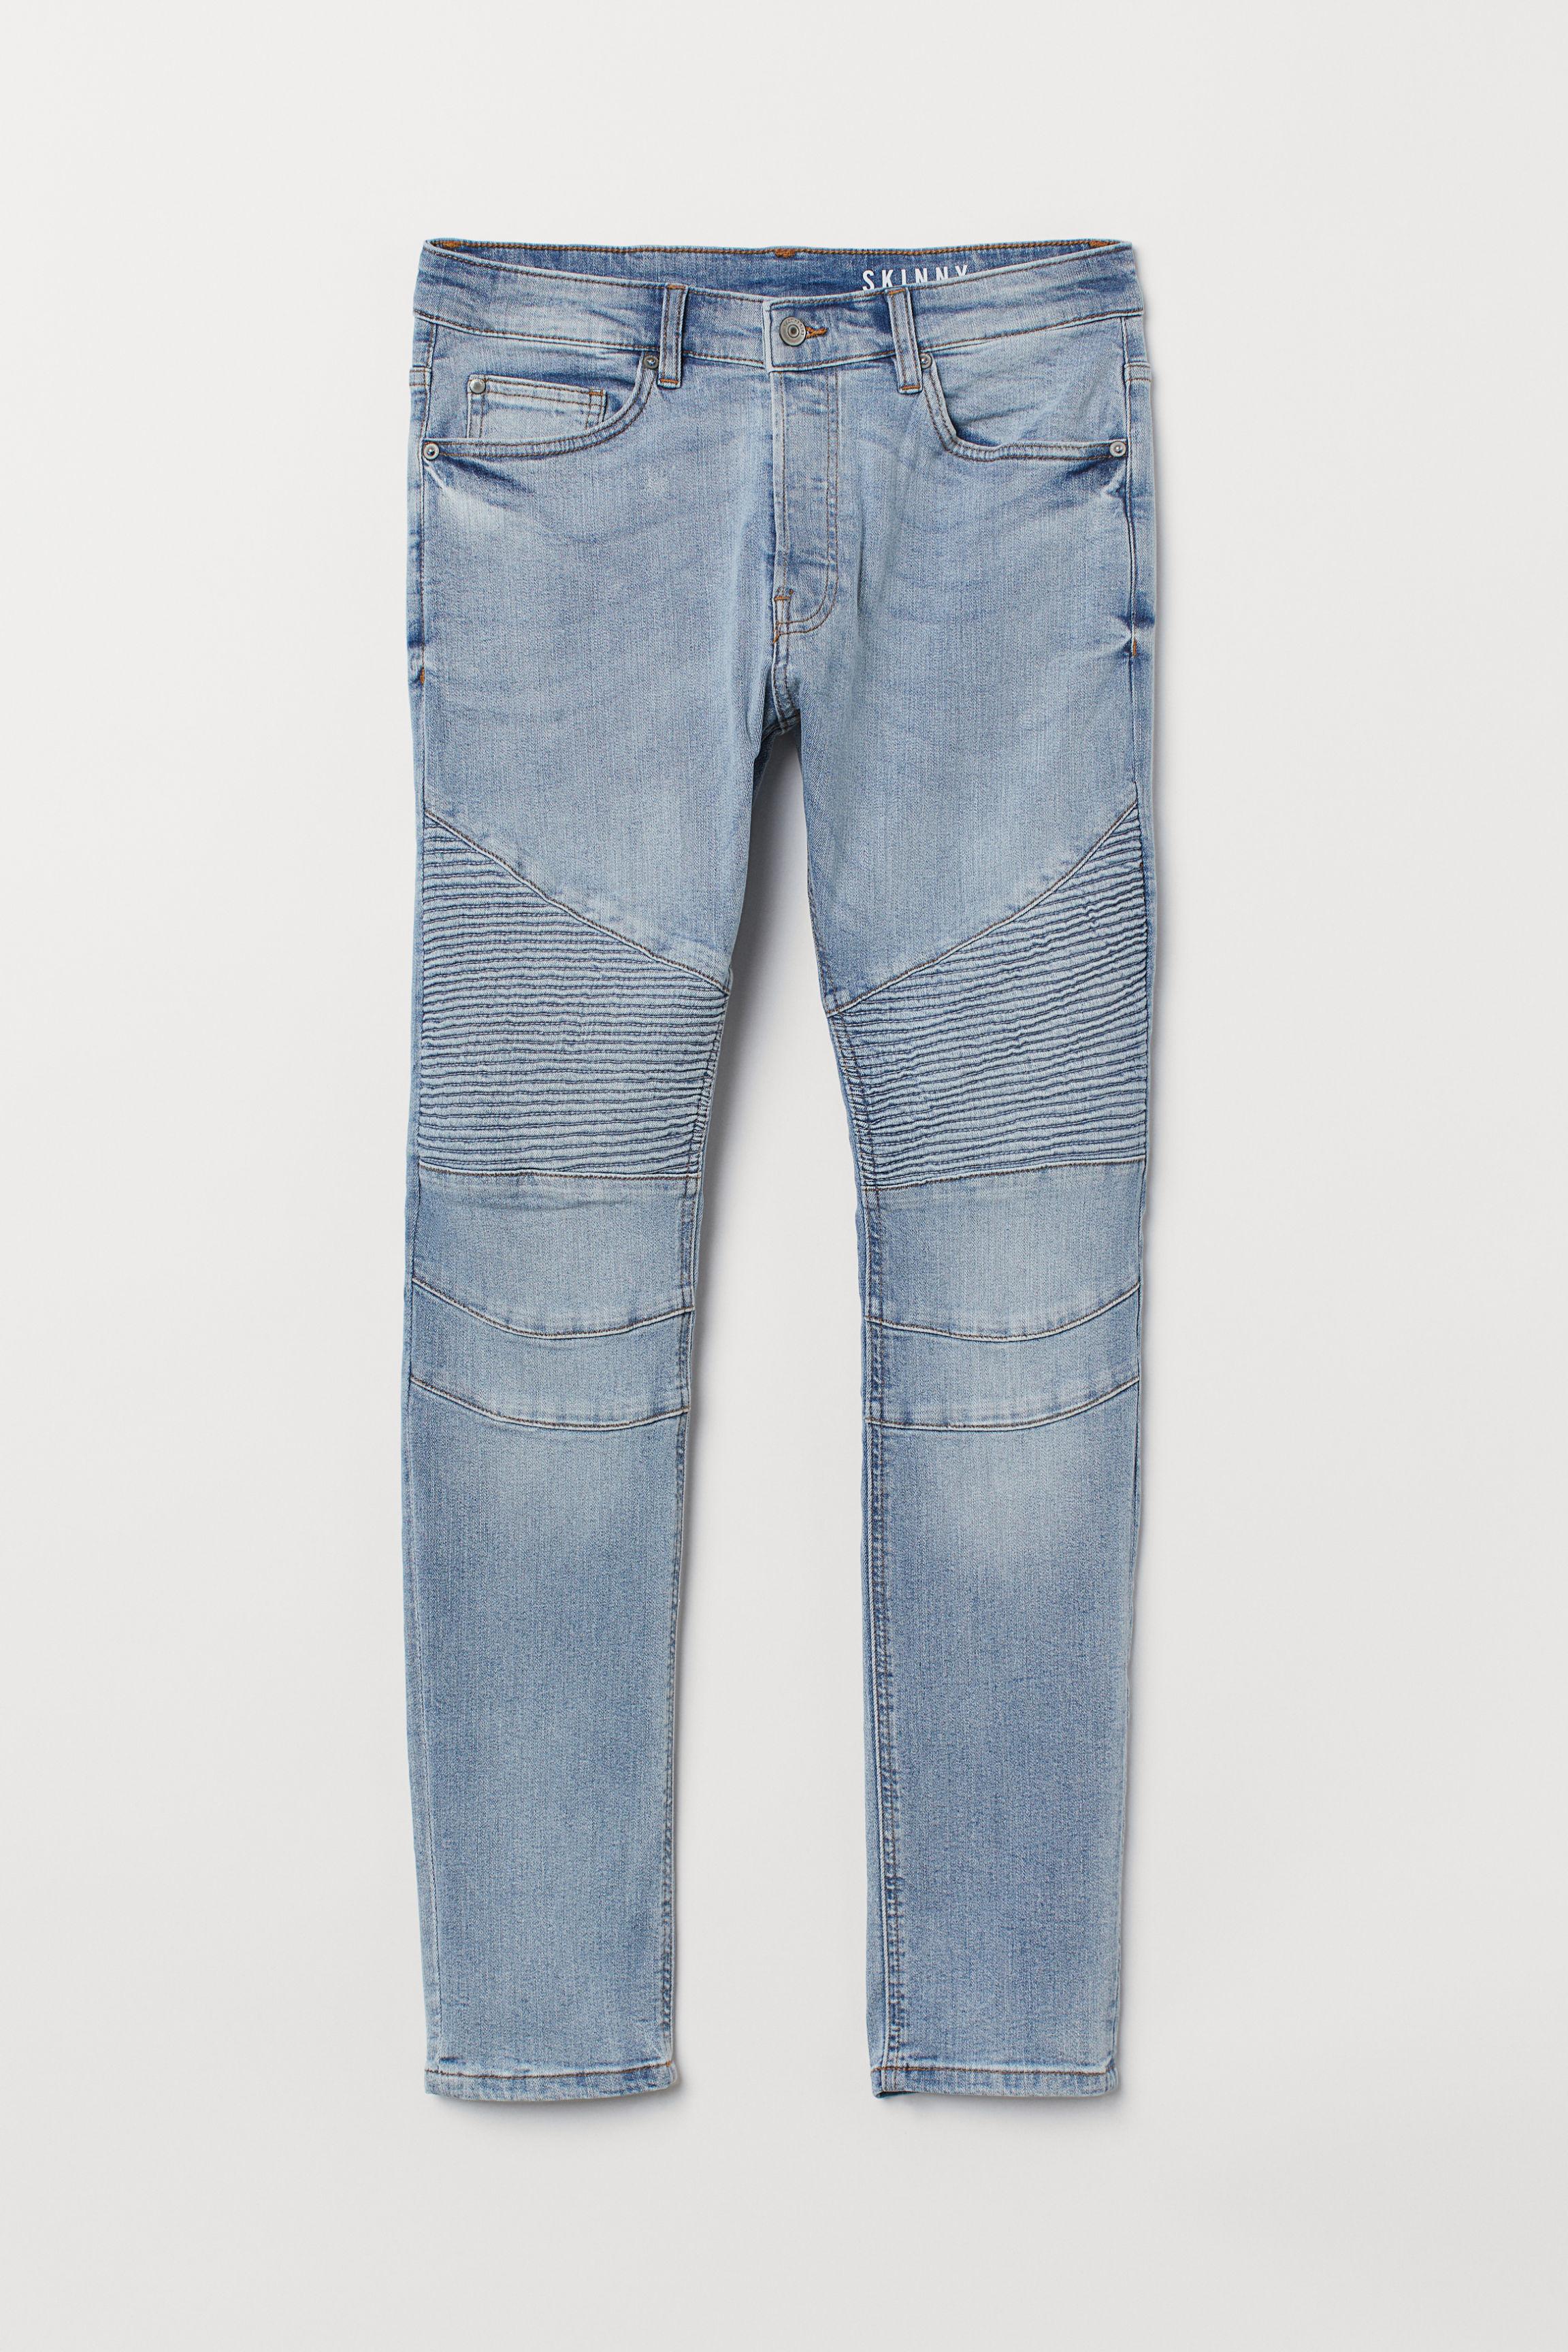 9e8e797d35b Skinny Biker Jeans - Light denim blue - Men | H&M US